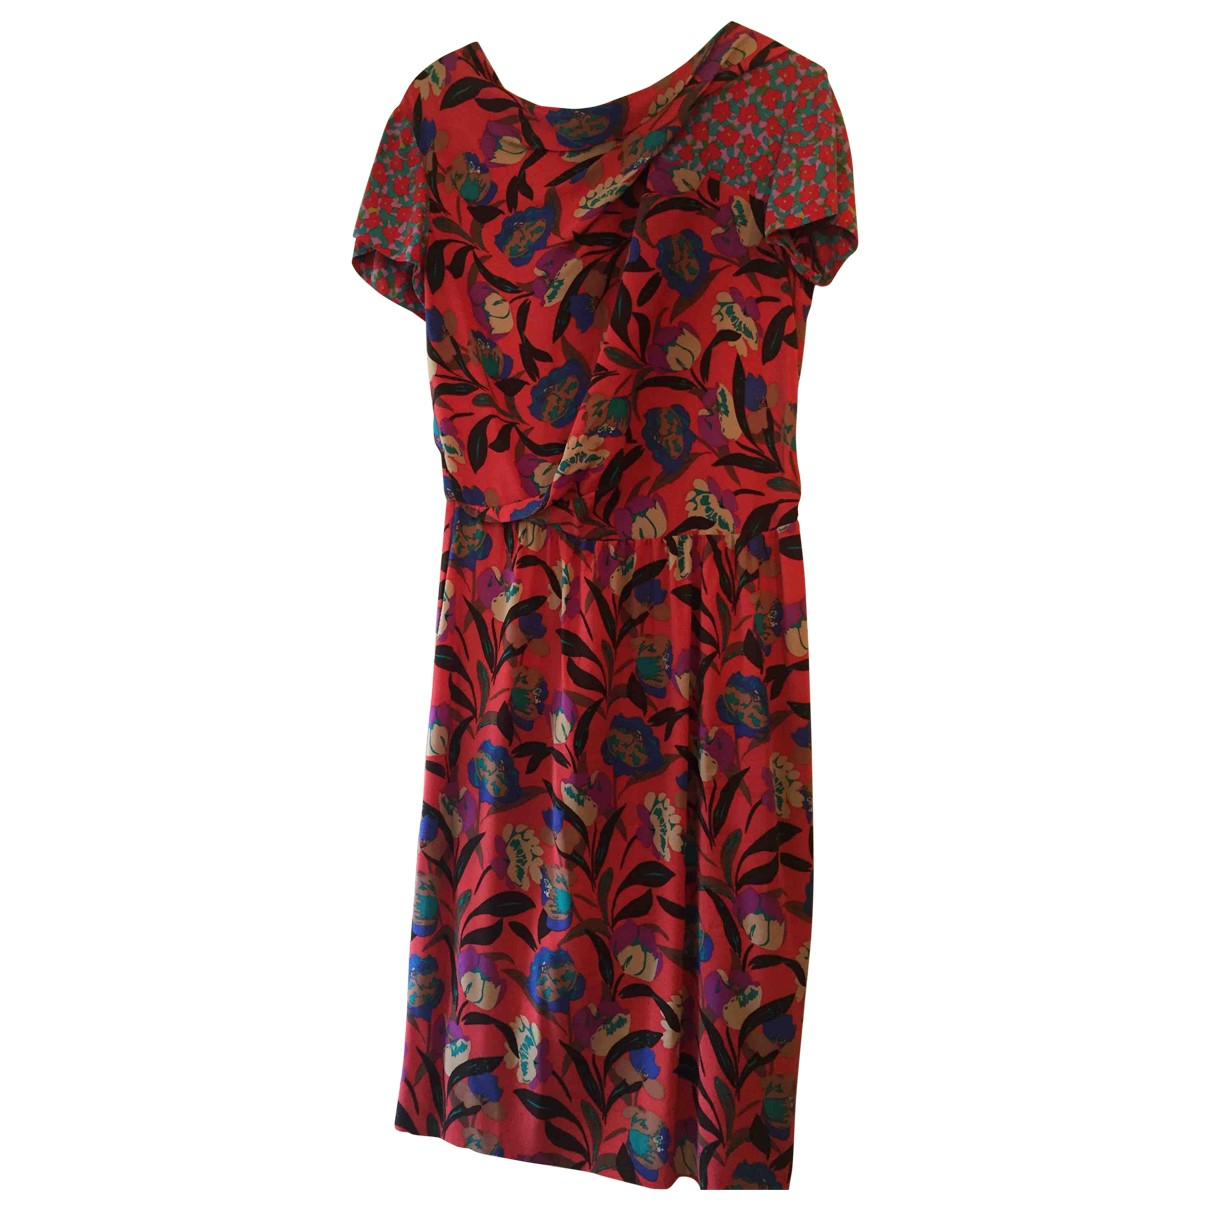 Etro \N Red Silk dress for Women 46 FR